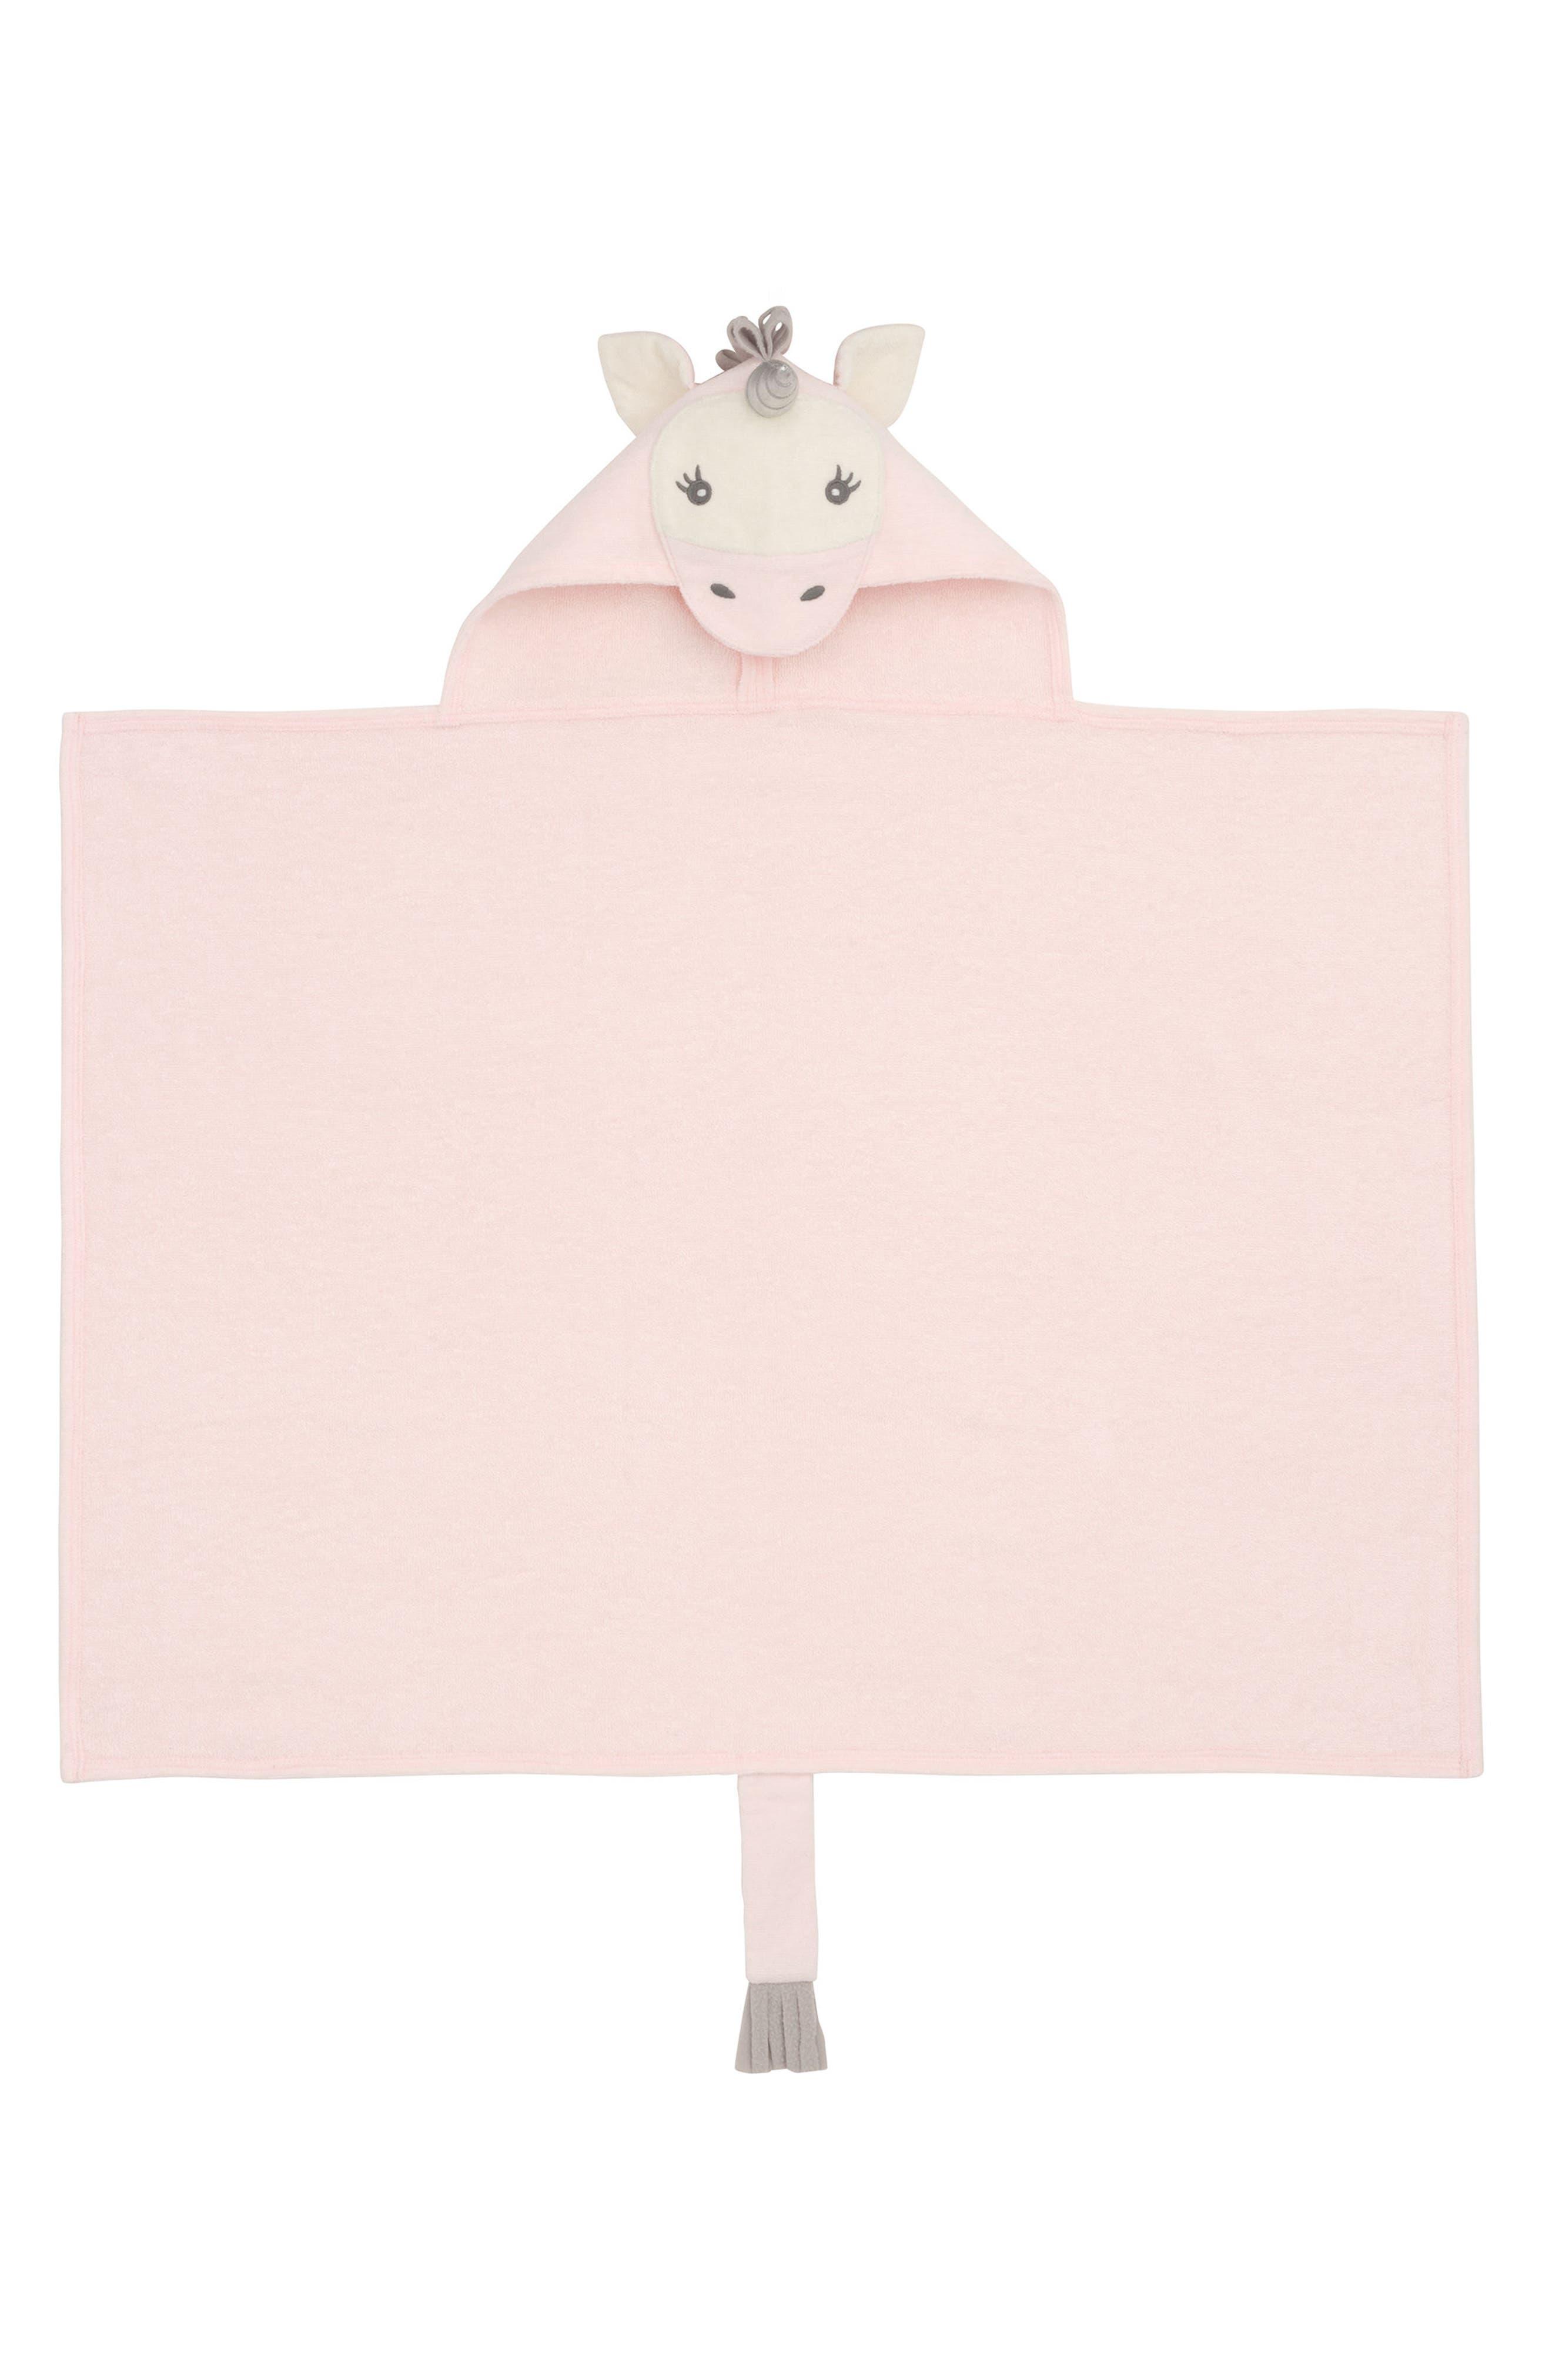 Terry Velour Hooded Unicorn Towel,                             Alternate thumbnail 2, color,                             UNICORN